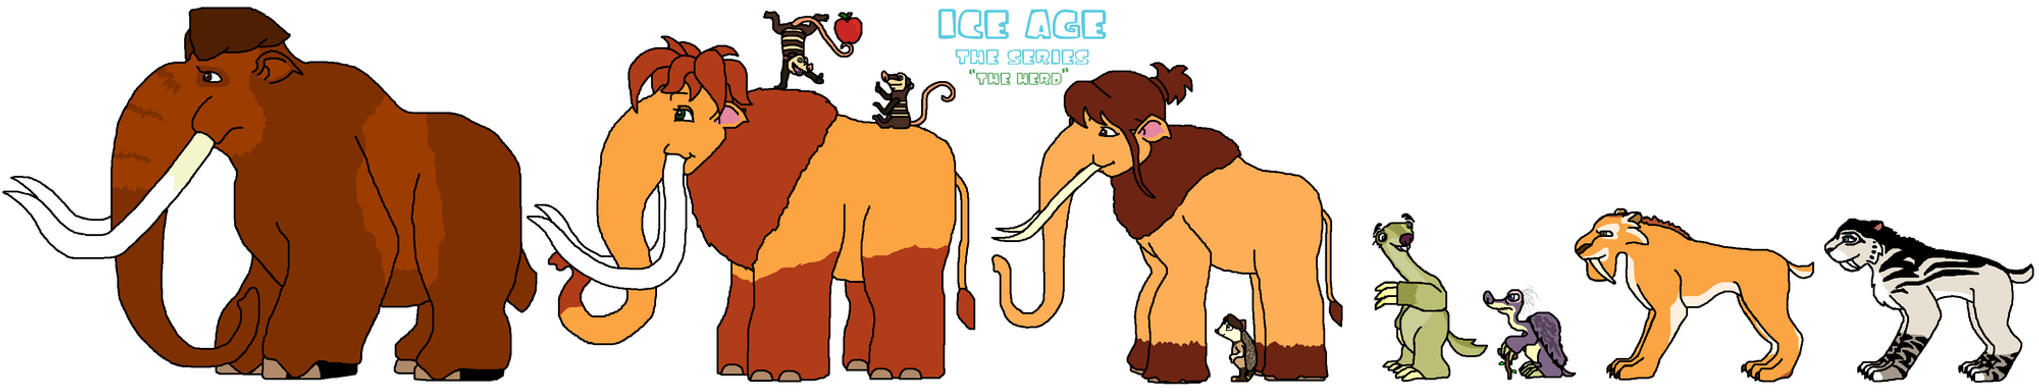 Ice Age The Series Concept By NinjaTurtleManiac On DeviantArt